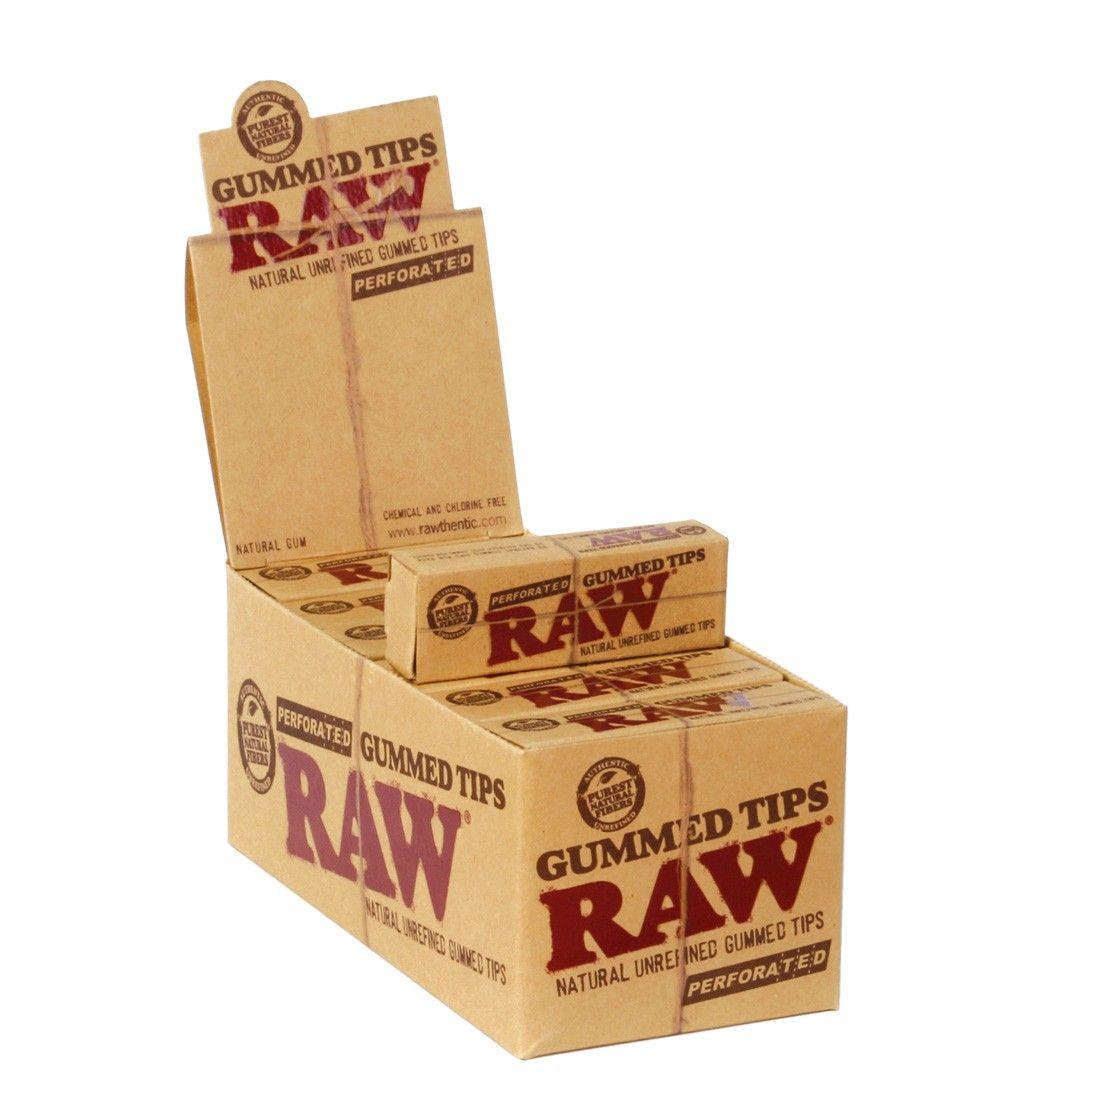 vente en ligne de boite de filtres raw gummed perfor s filtre en carton toncar. Black Bedroom Furniture Sets. Home Design Ideas